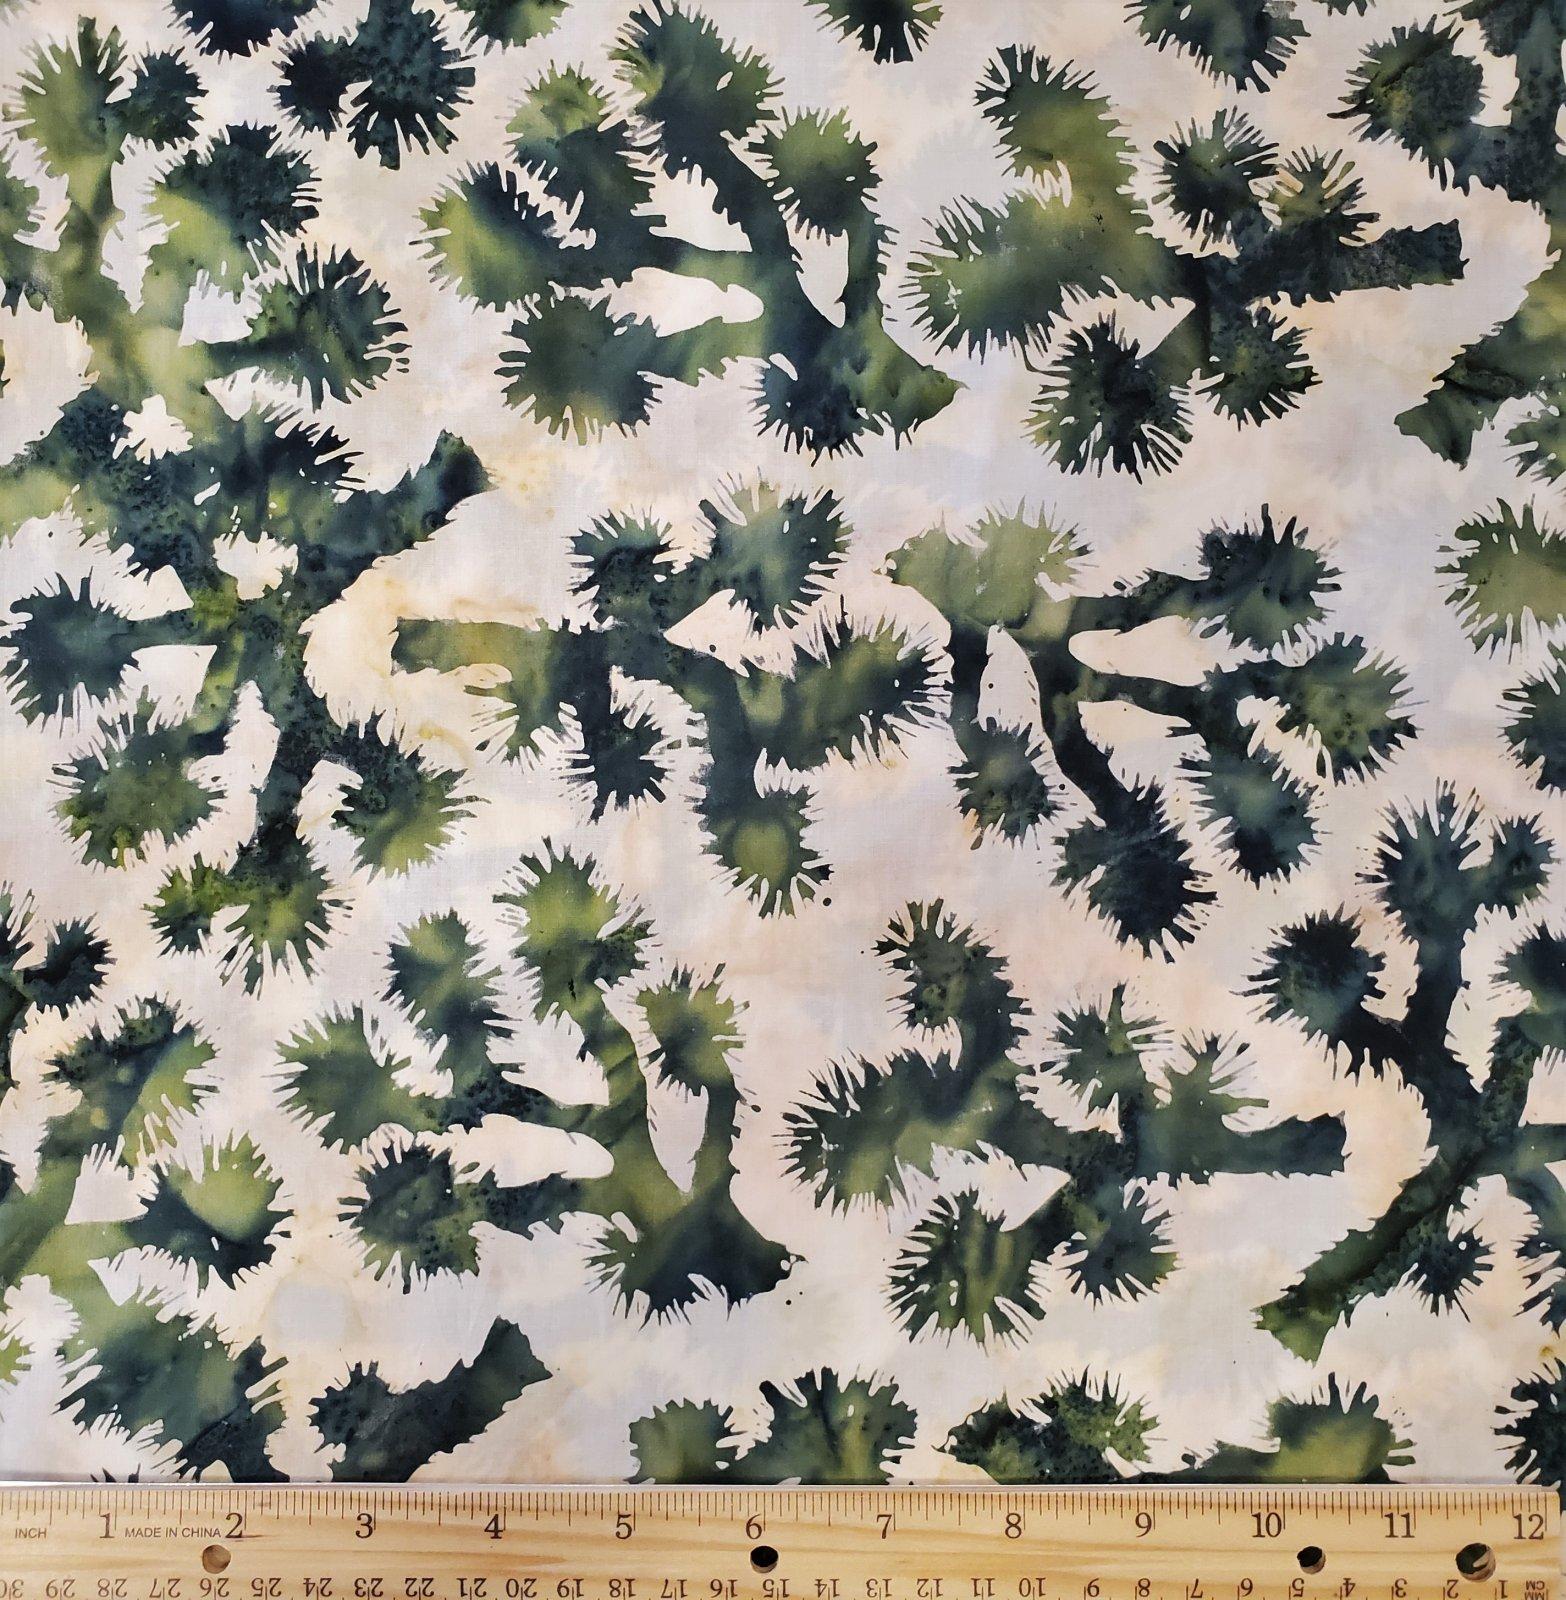 Bali Batik - Joshua Tree Asparagus - S2308-644